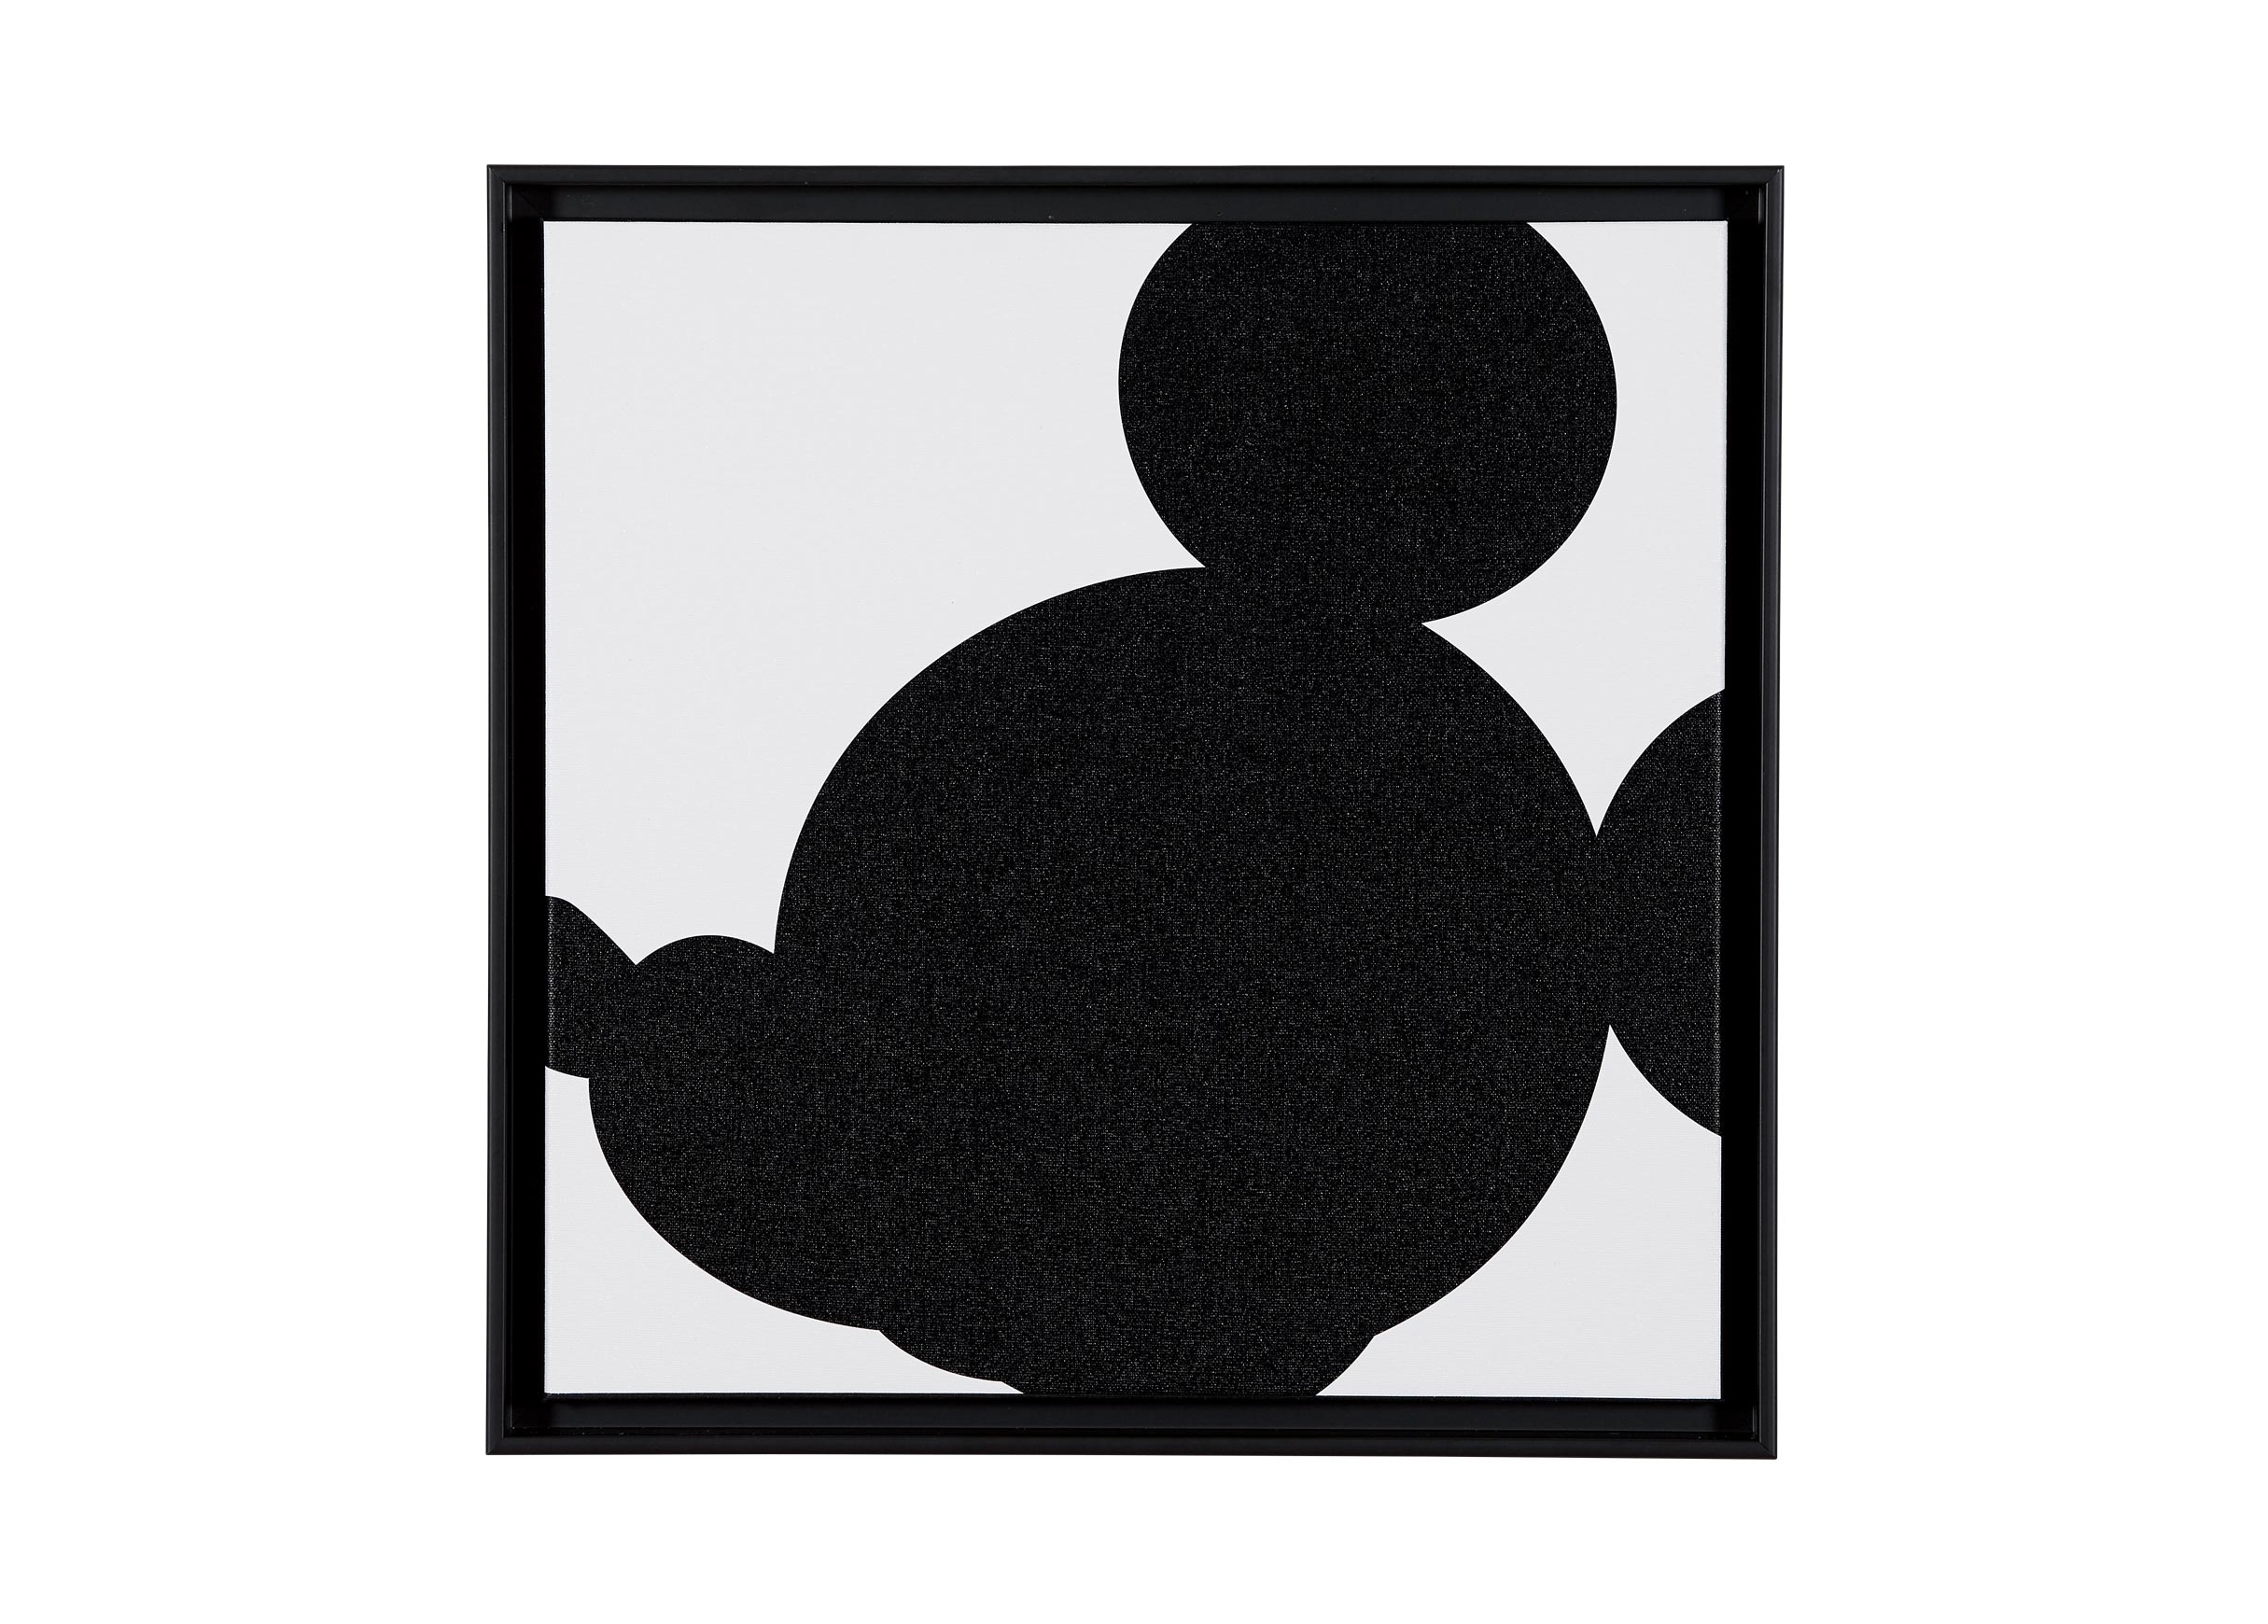 2430x1740 Mickey Quartet Part Iv Art Ethan Allen